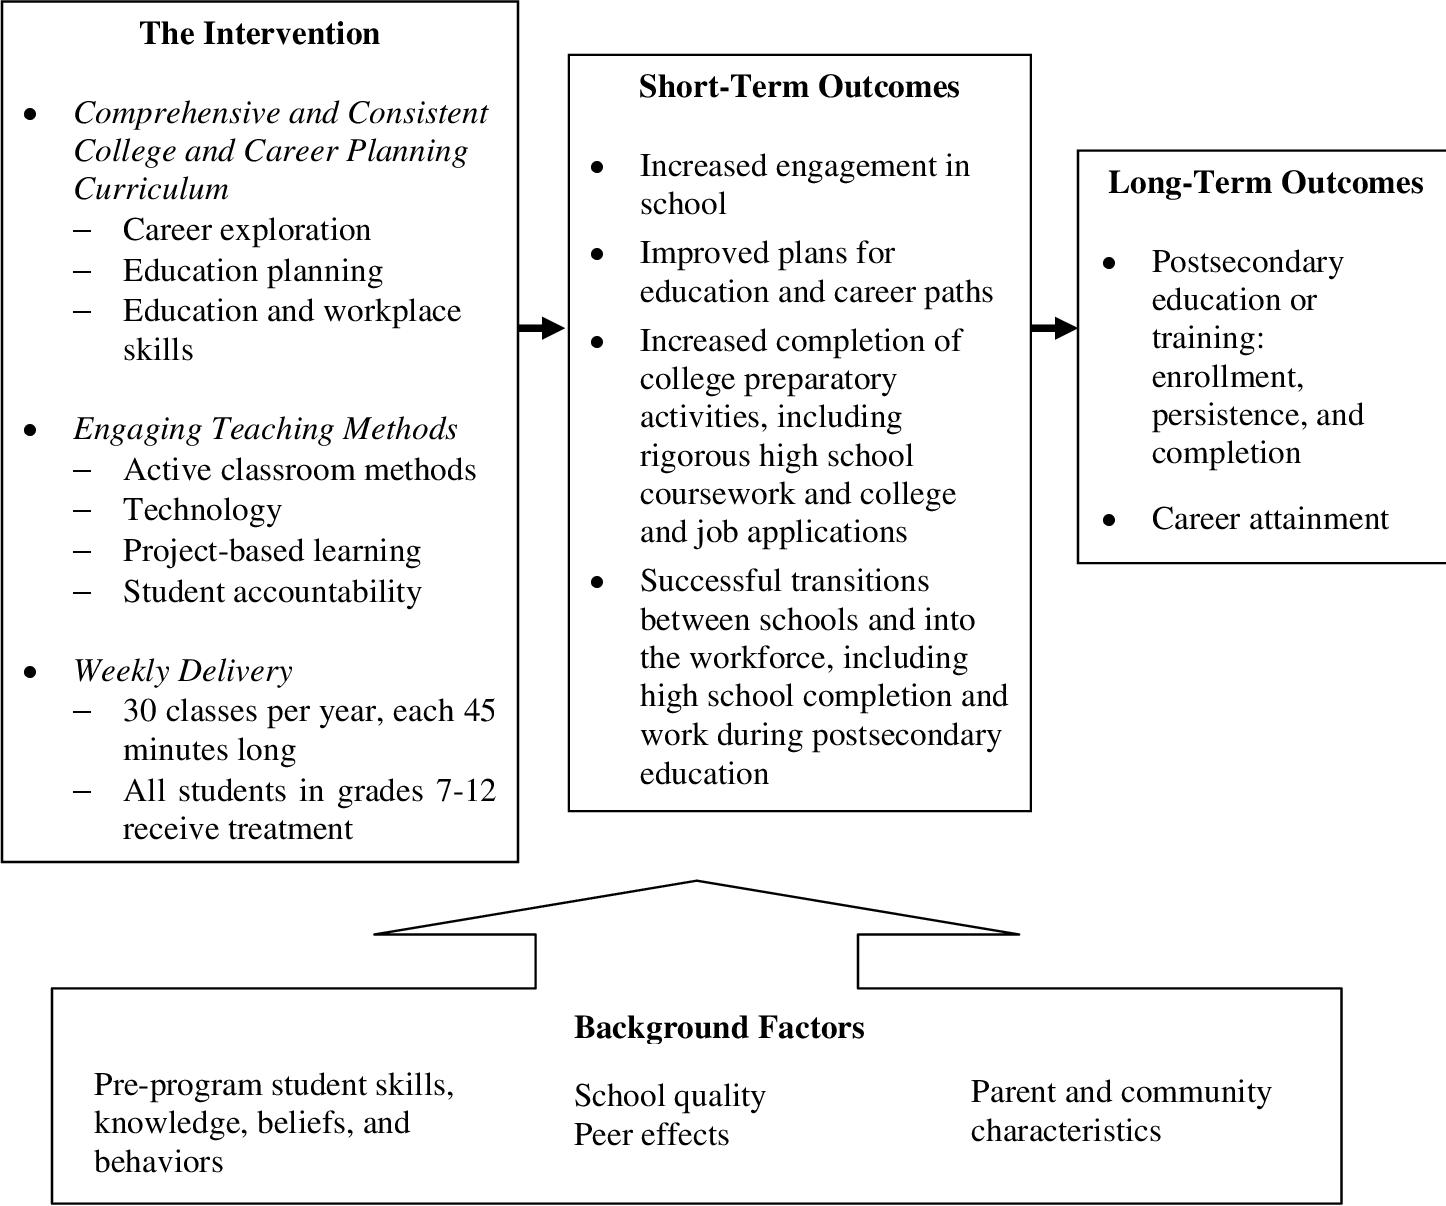 Dissertation help ireland online application programs